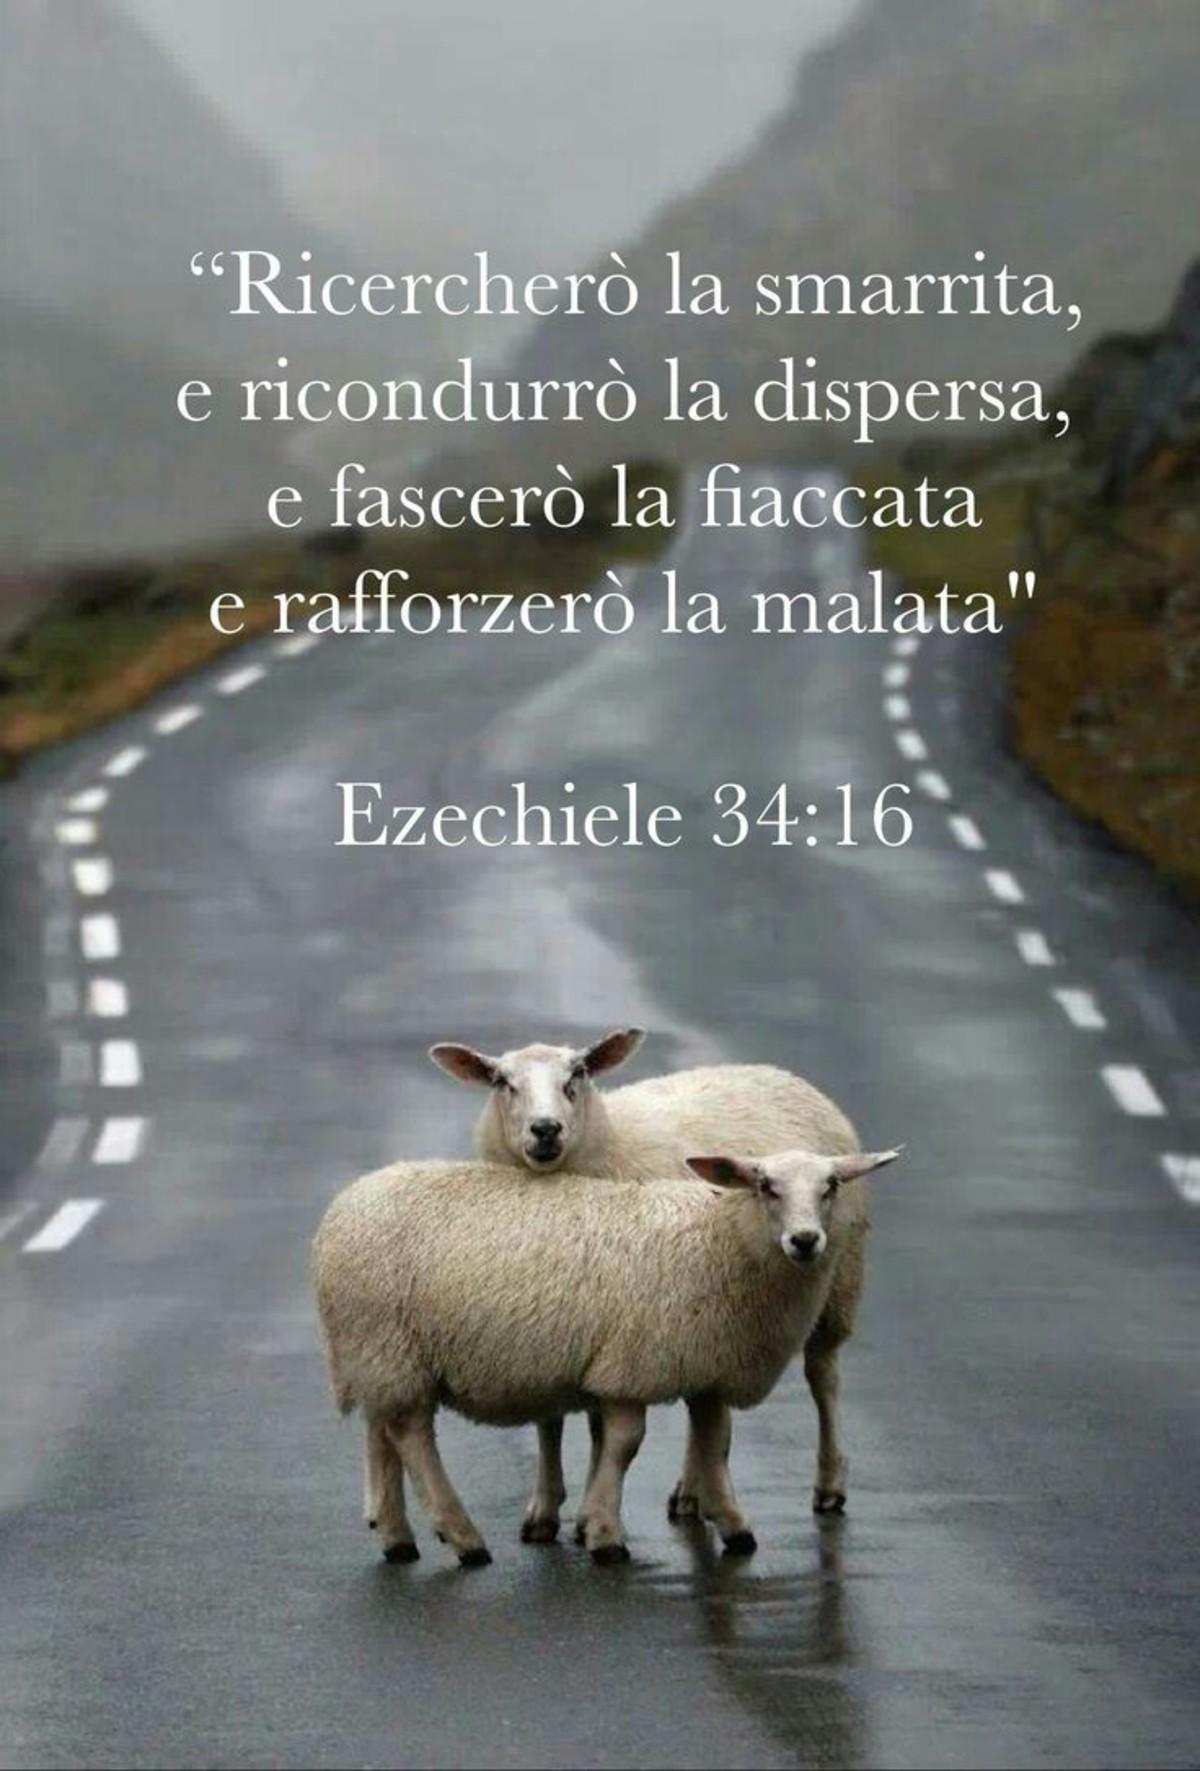 Versi della Bibbia Ezechiele 34 16